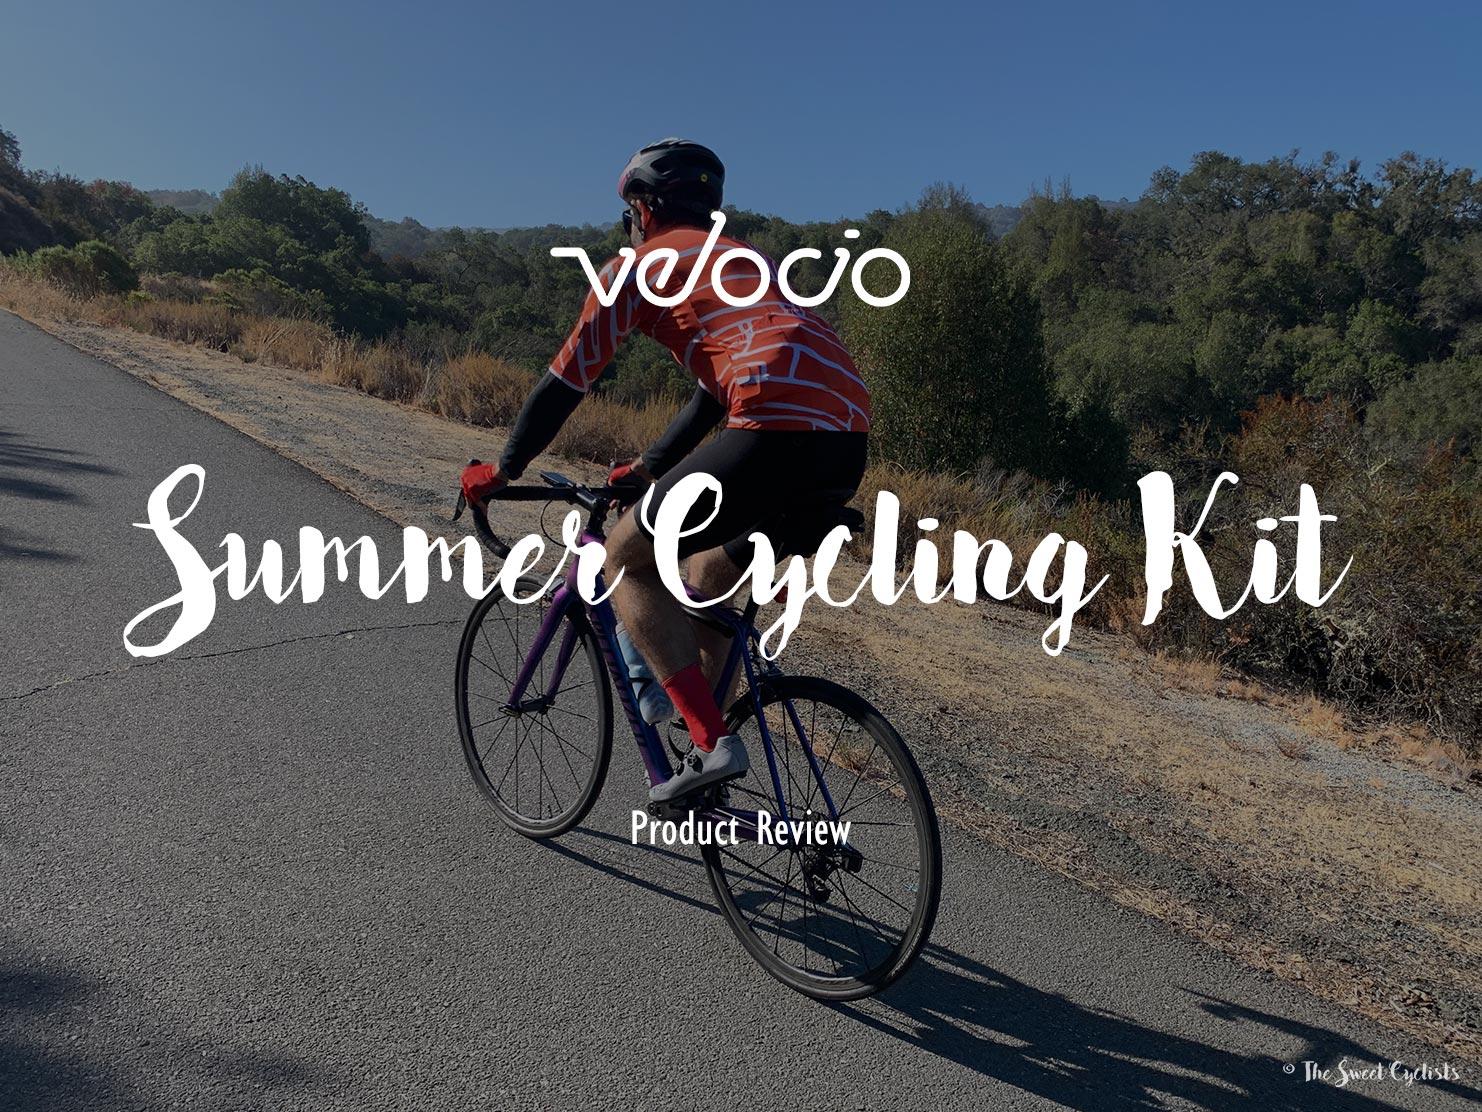 Velocio's warm weather cycling kit